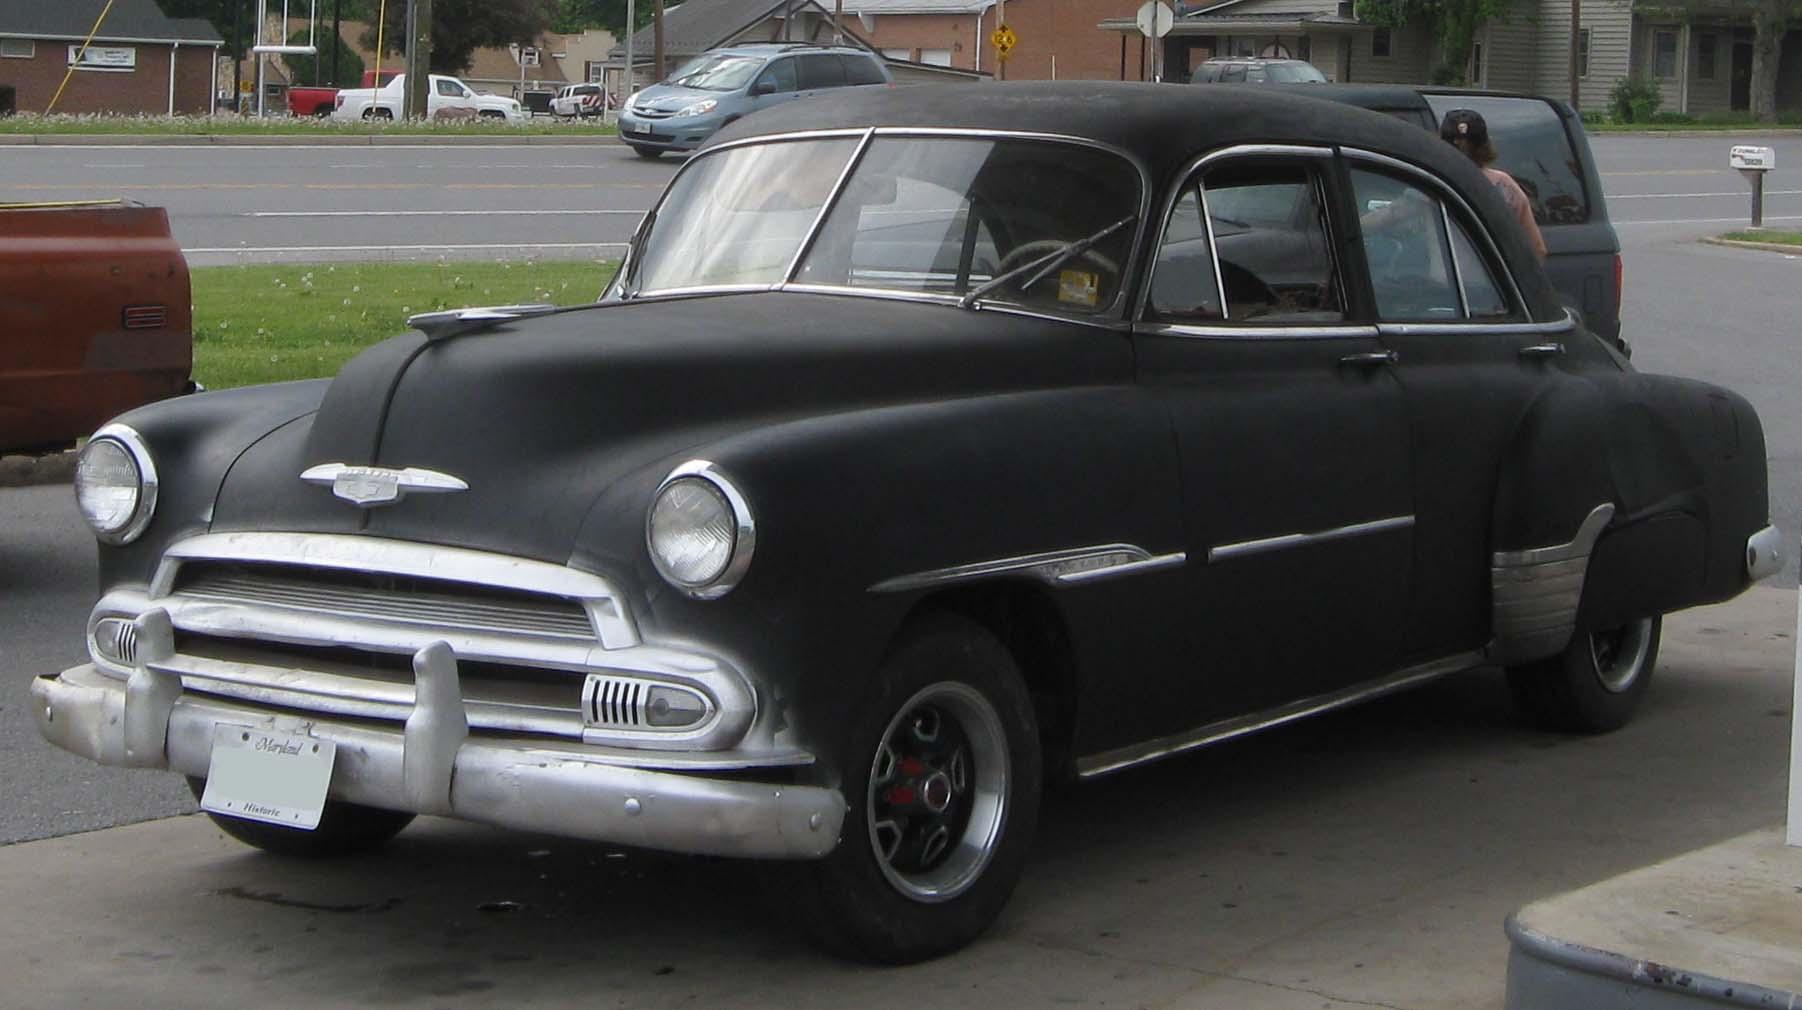 1951 chevy sedan file 1951 chevrolet sedan 05 02 2010 jpg